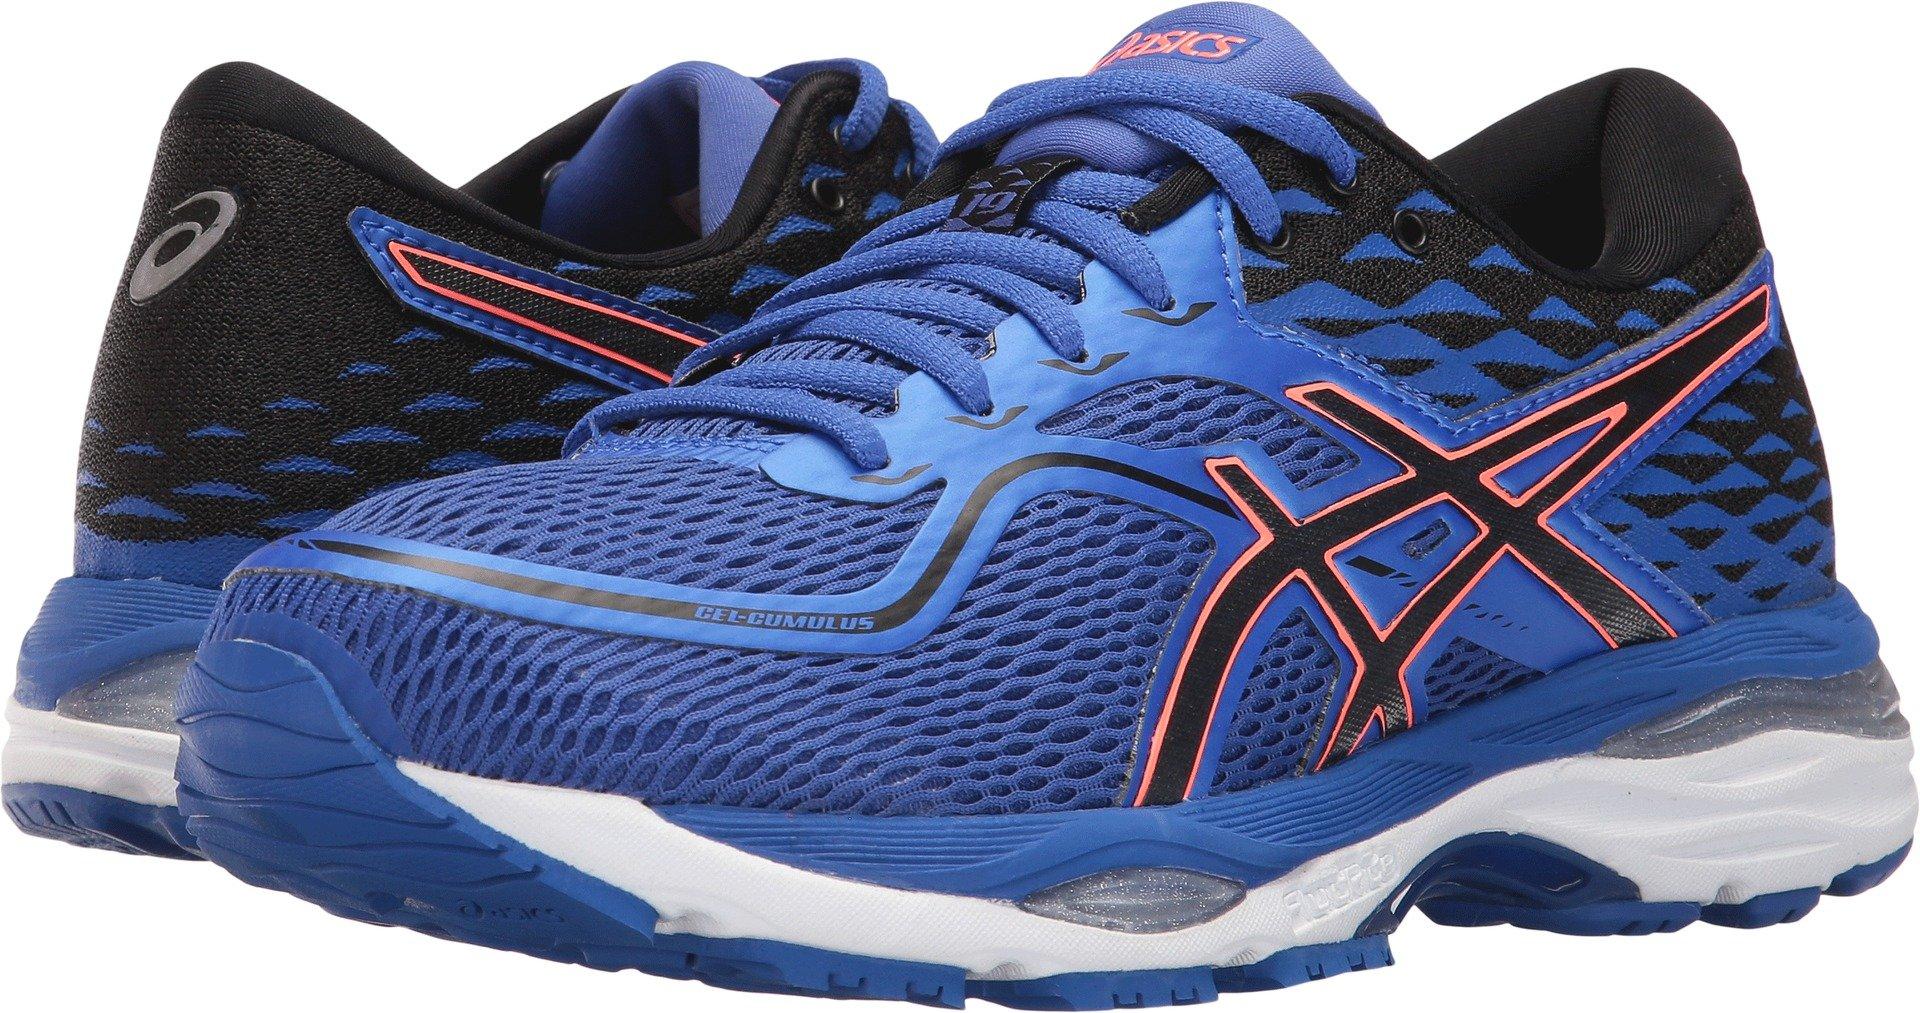 6bc66610 ASICS Womens Gel-Cumulus 19 Running Shoe, Blue Purple/Black/Flash Coral,  9.5 2A US